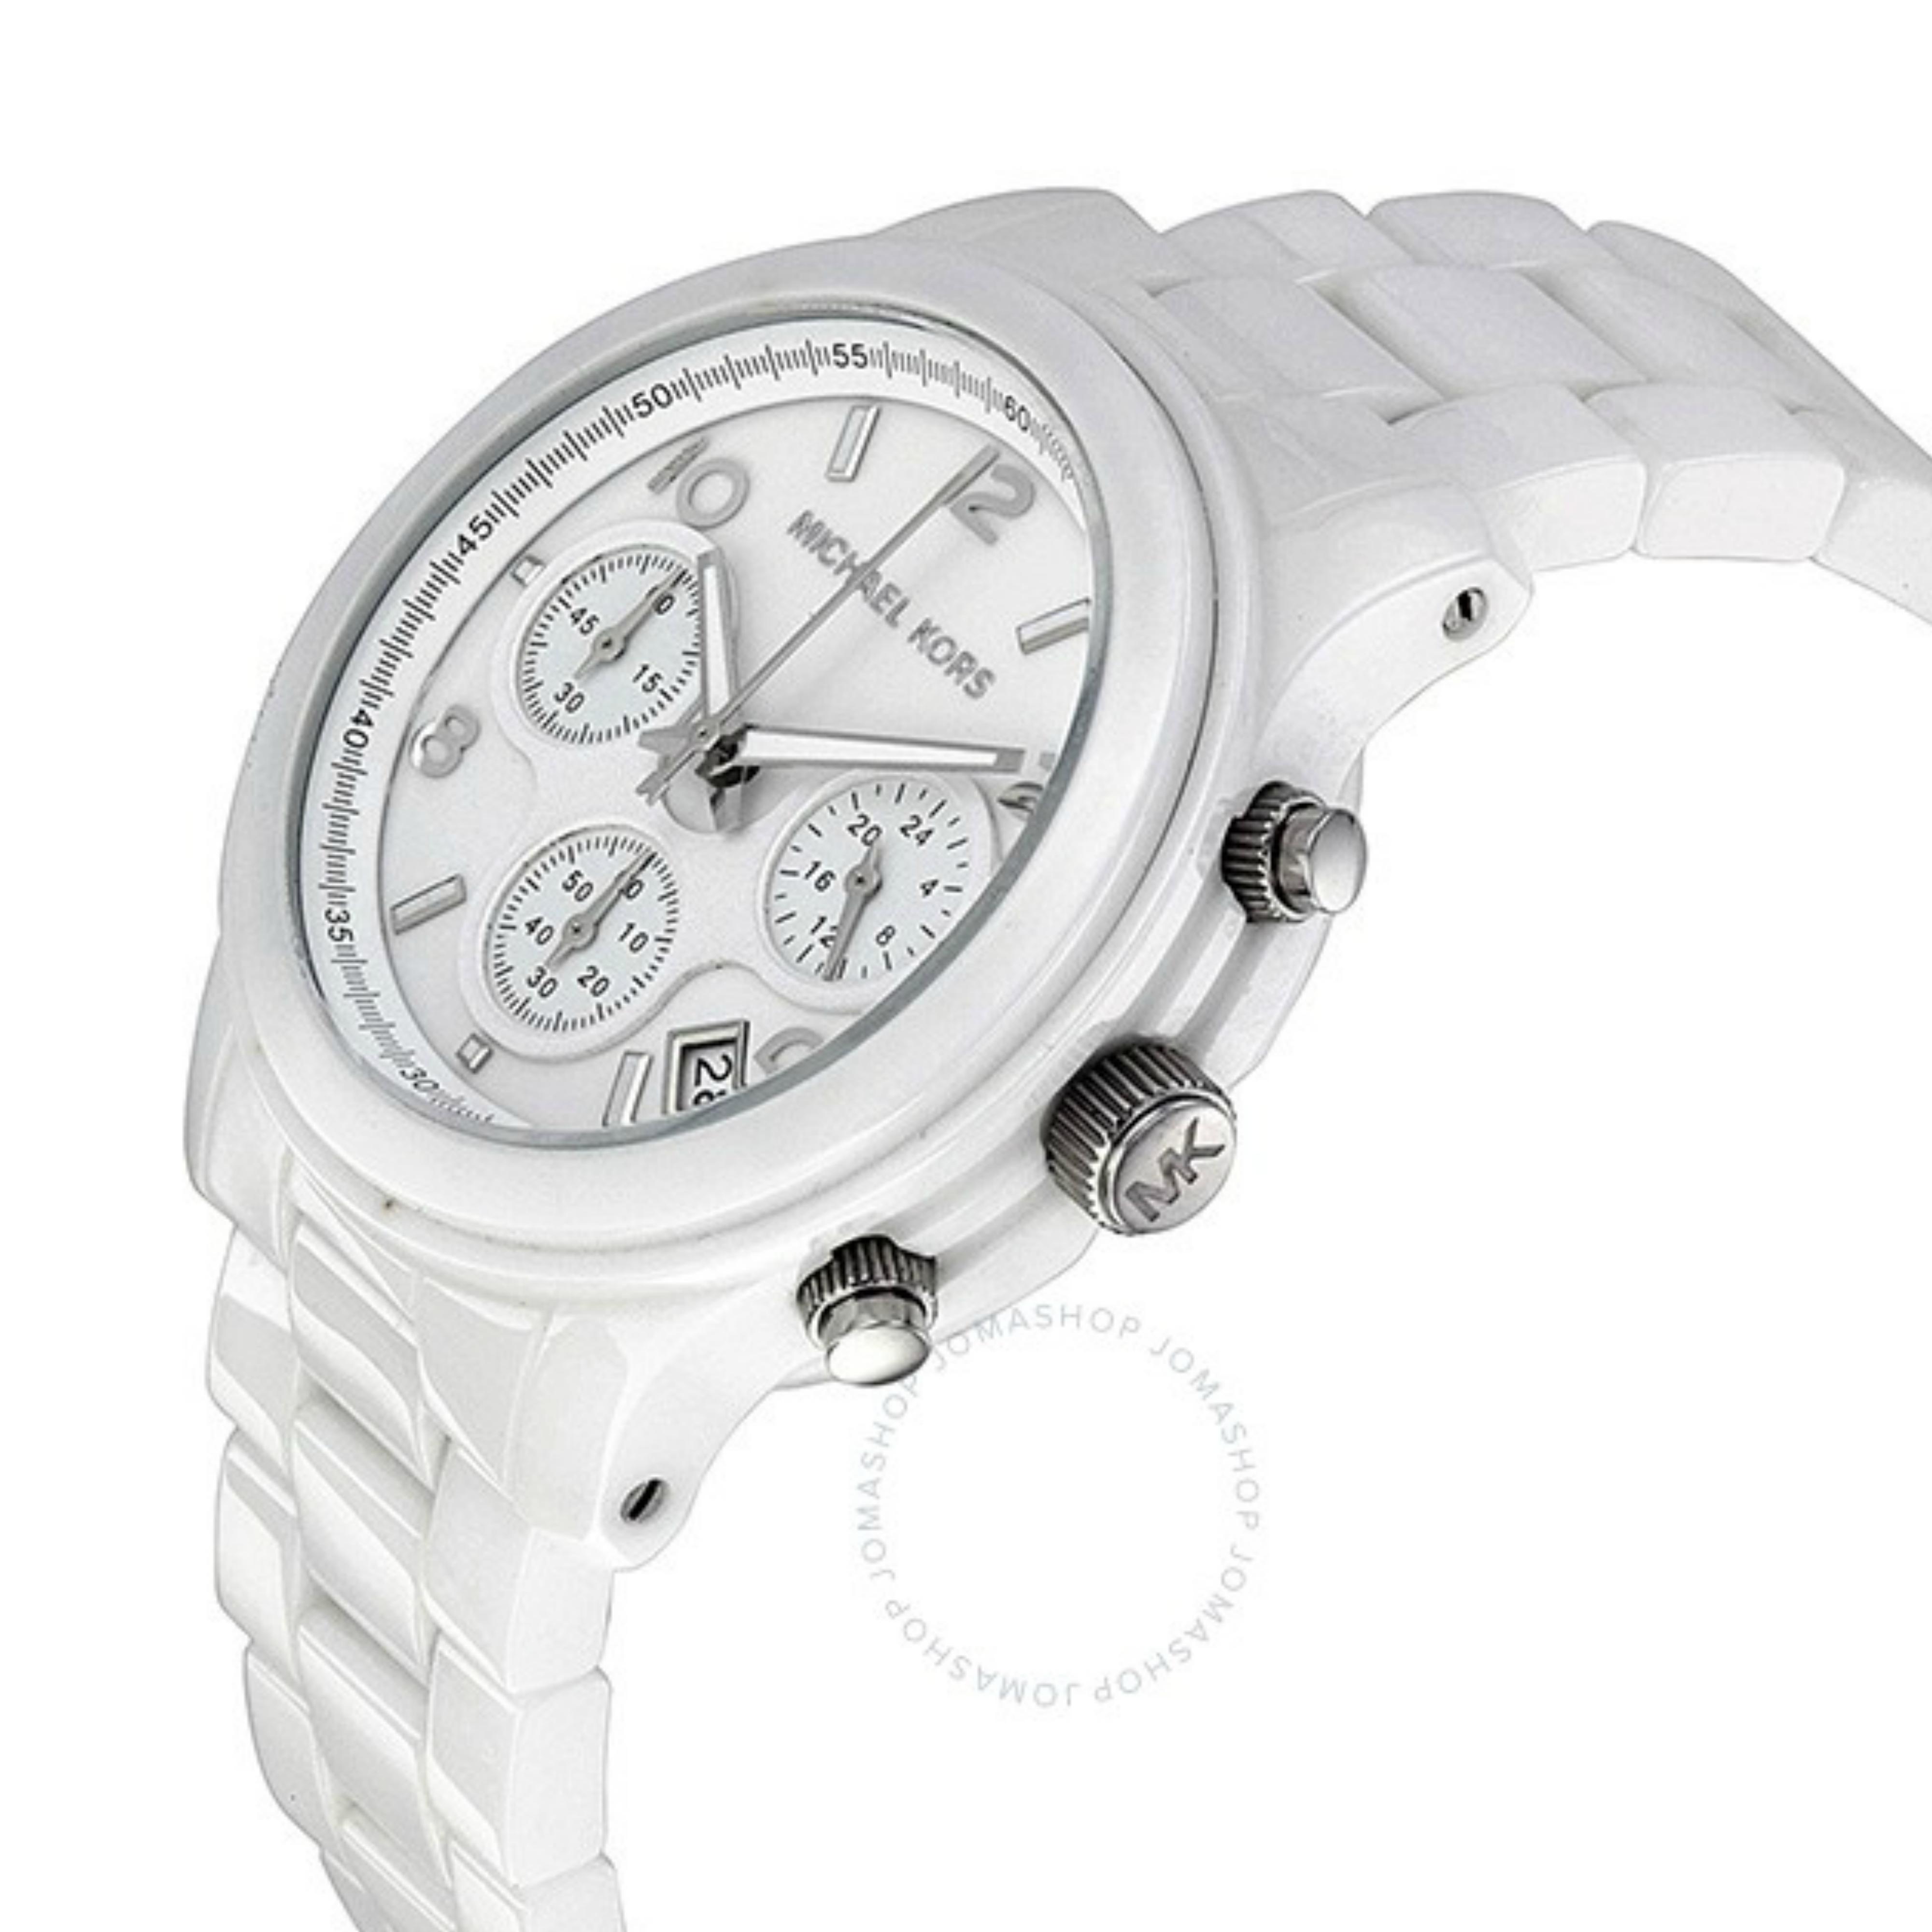 90280ba8e39d Michael Kors Runway Ladies  White Ceramic Bracelet Chrono Designer Watch  MK5161 Thumbnail 2